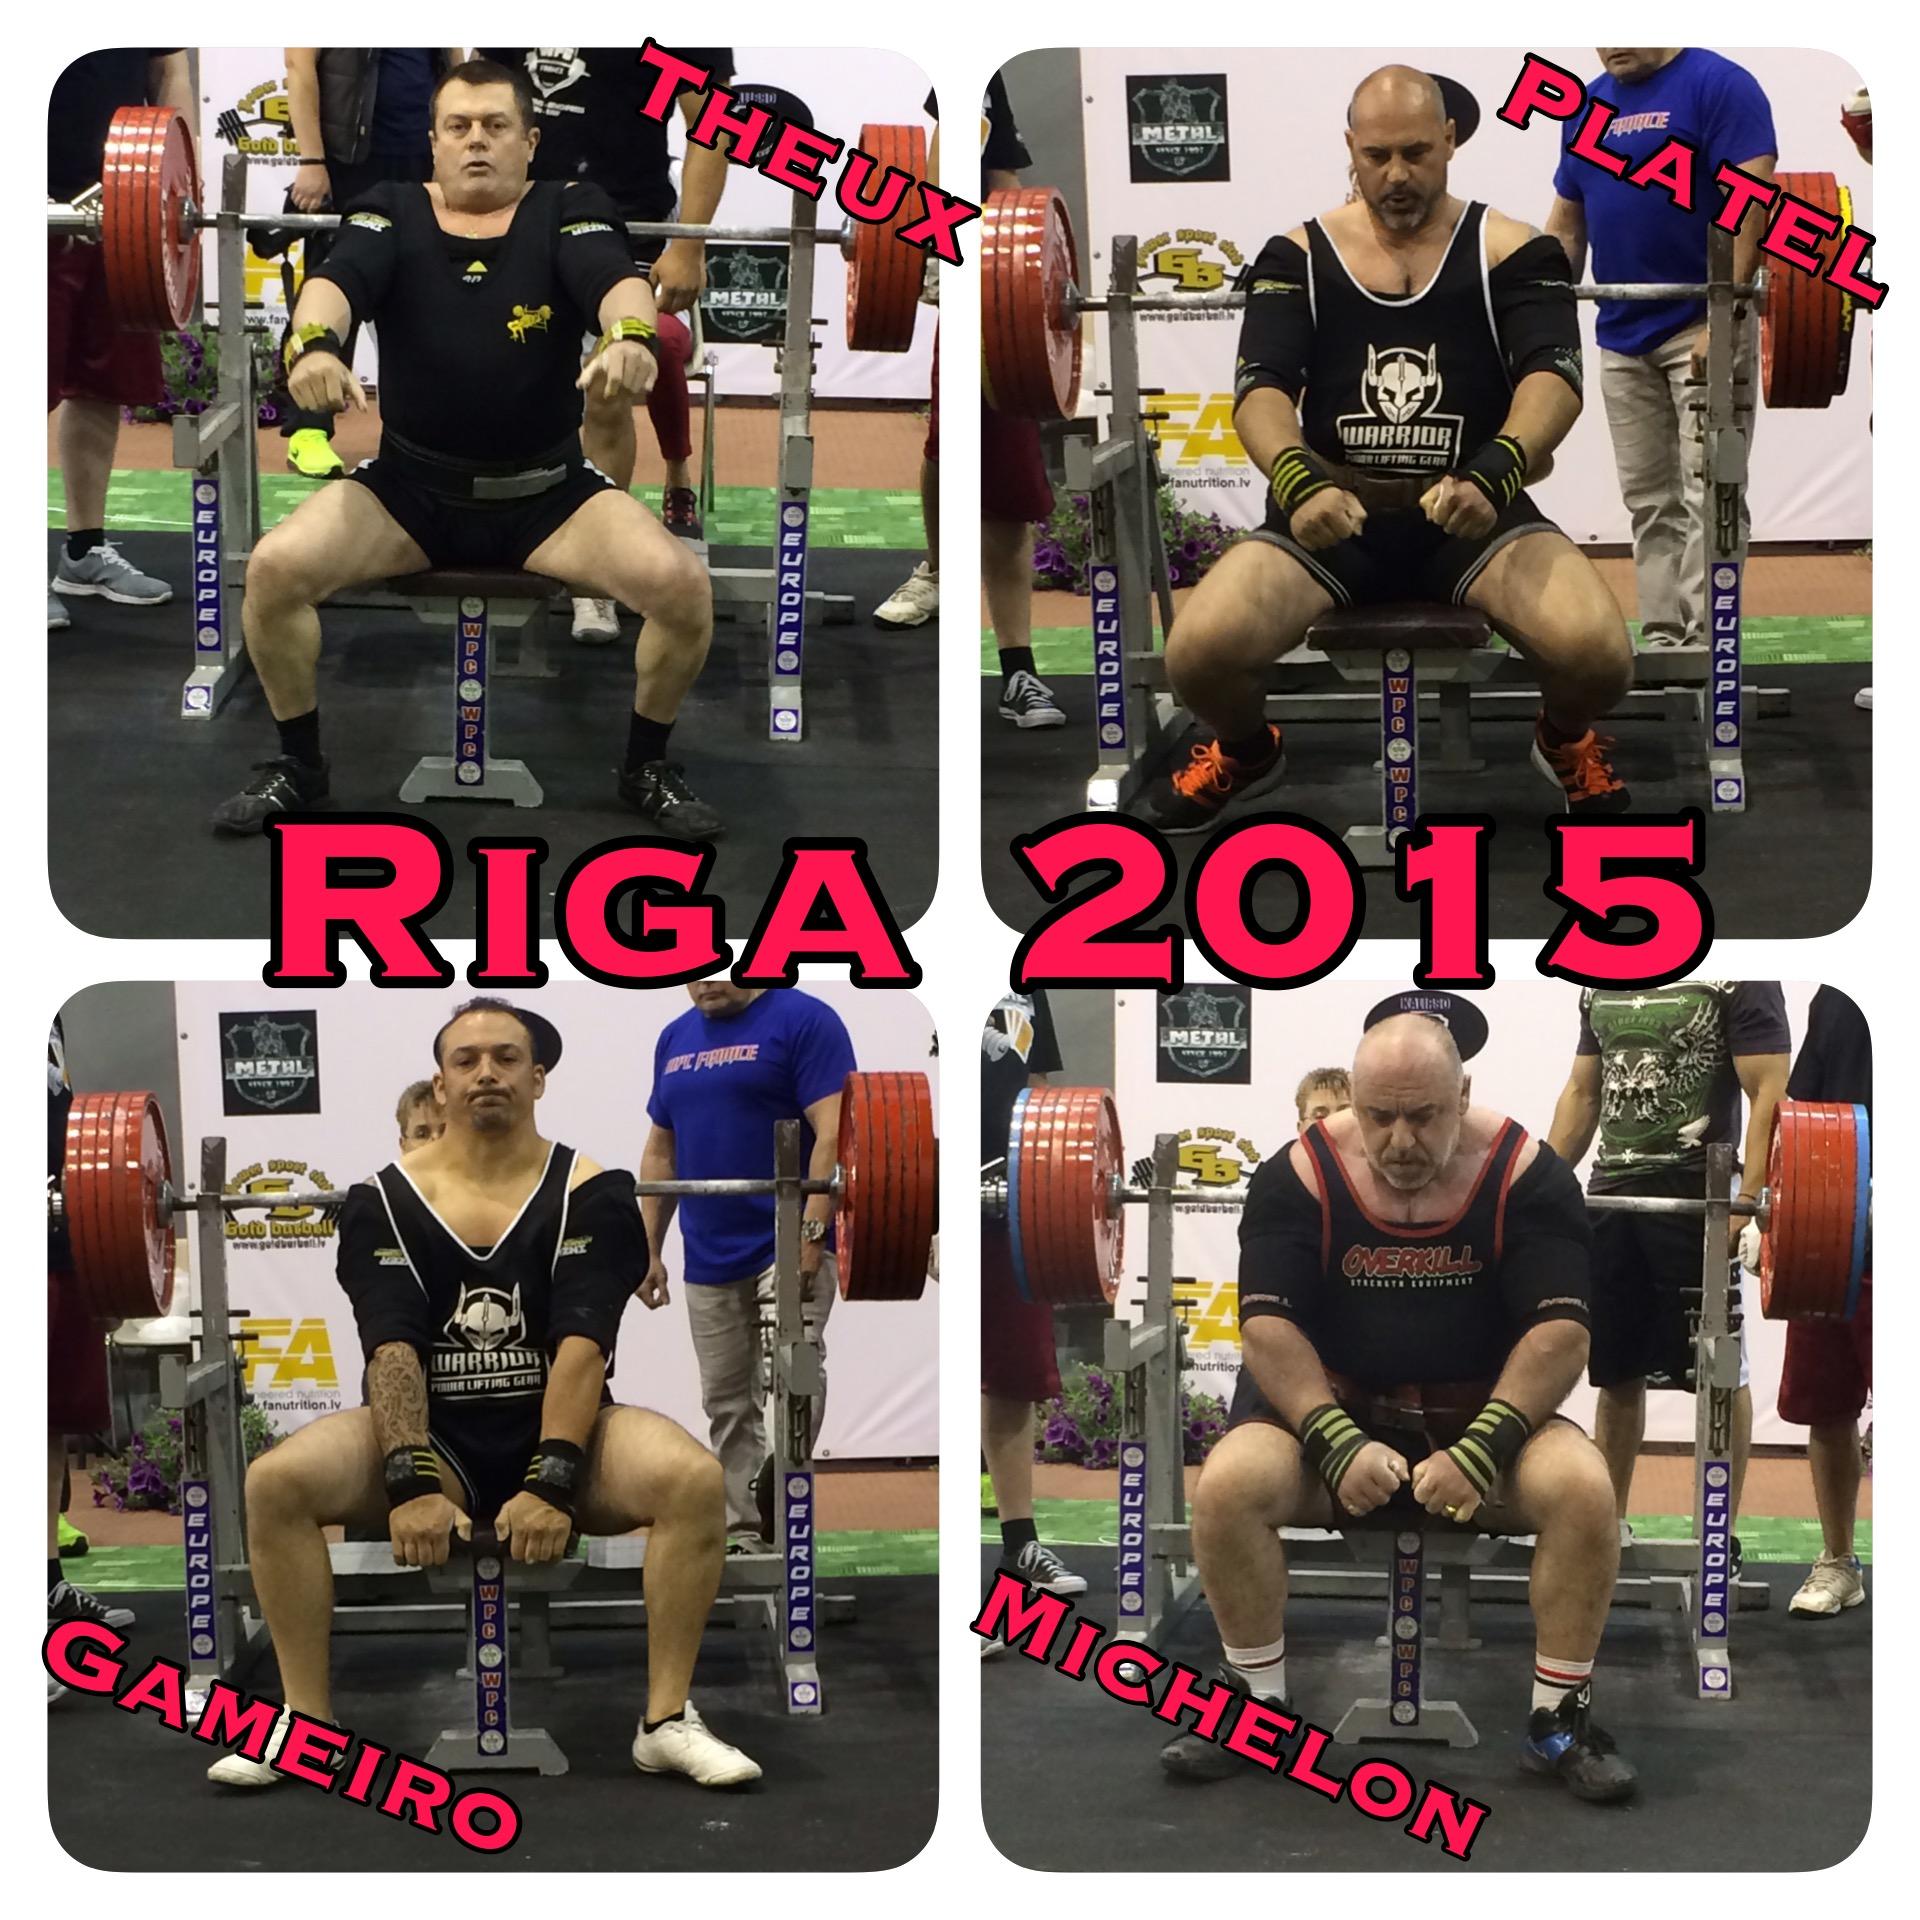 Europe 2015 Riga benchpress wpc france